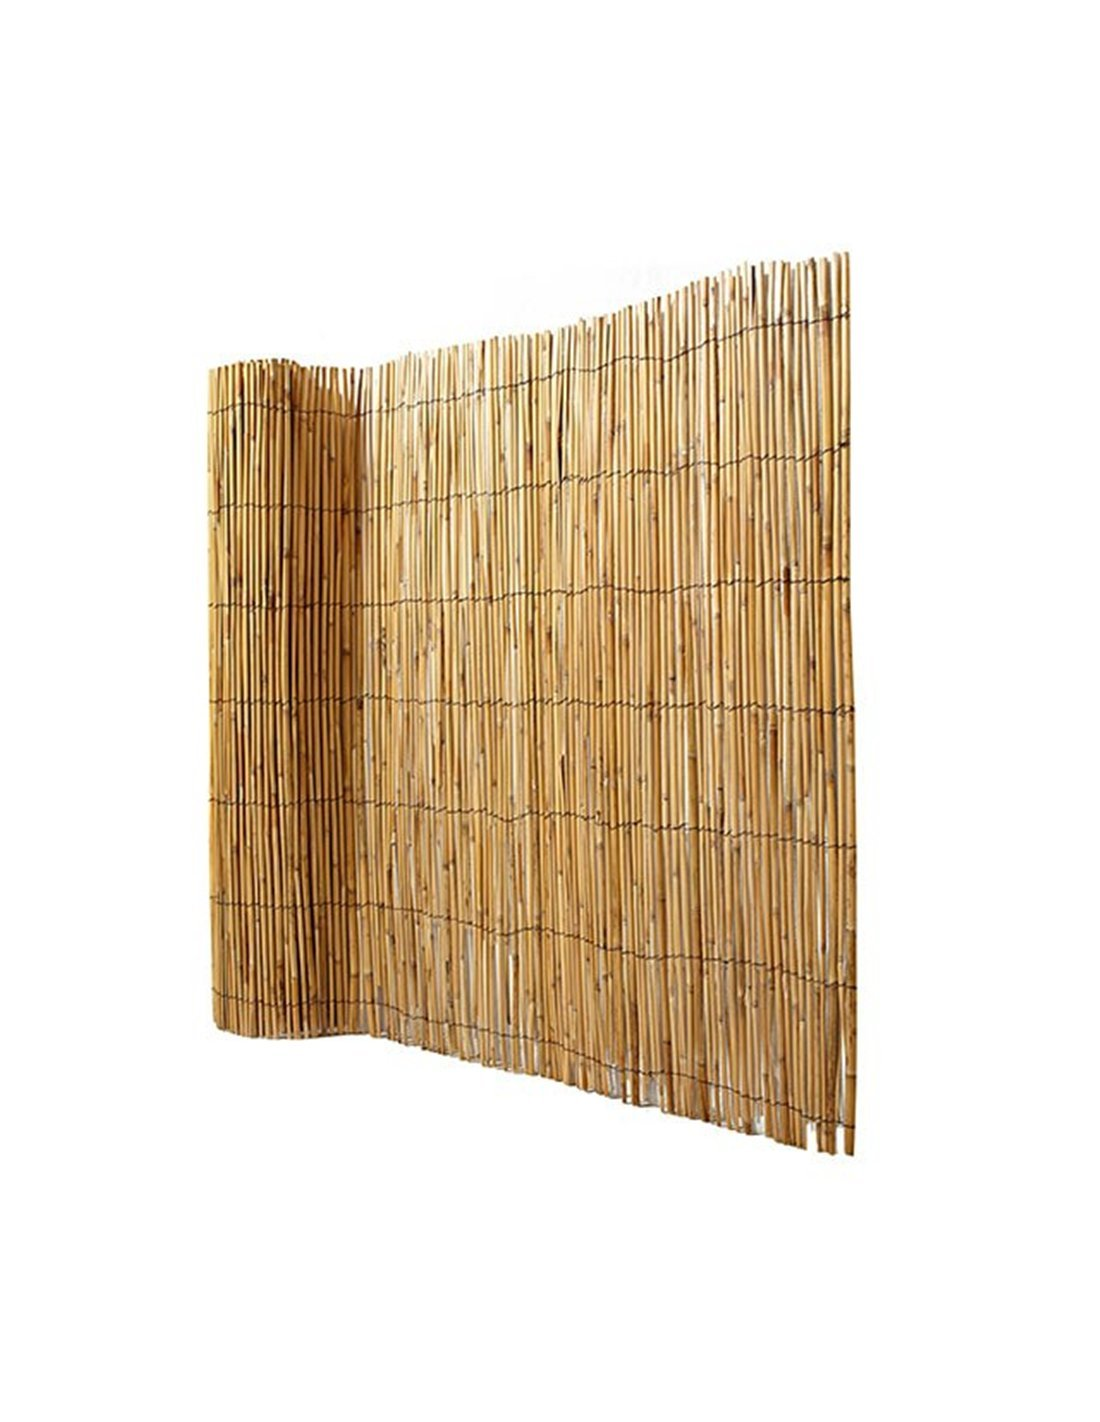 Faura 1, 5x5m - Bambu Natural: Amazon.es: Jardín